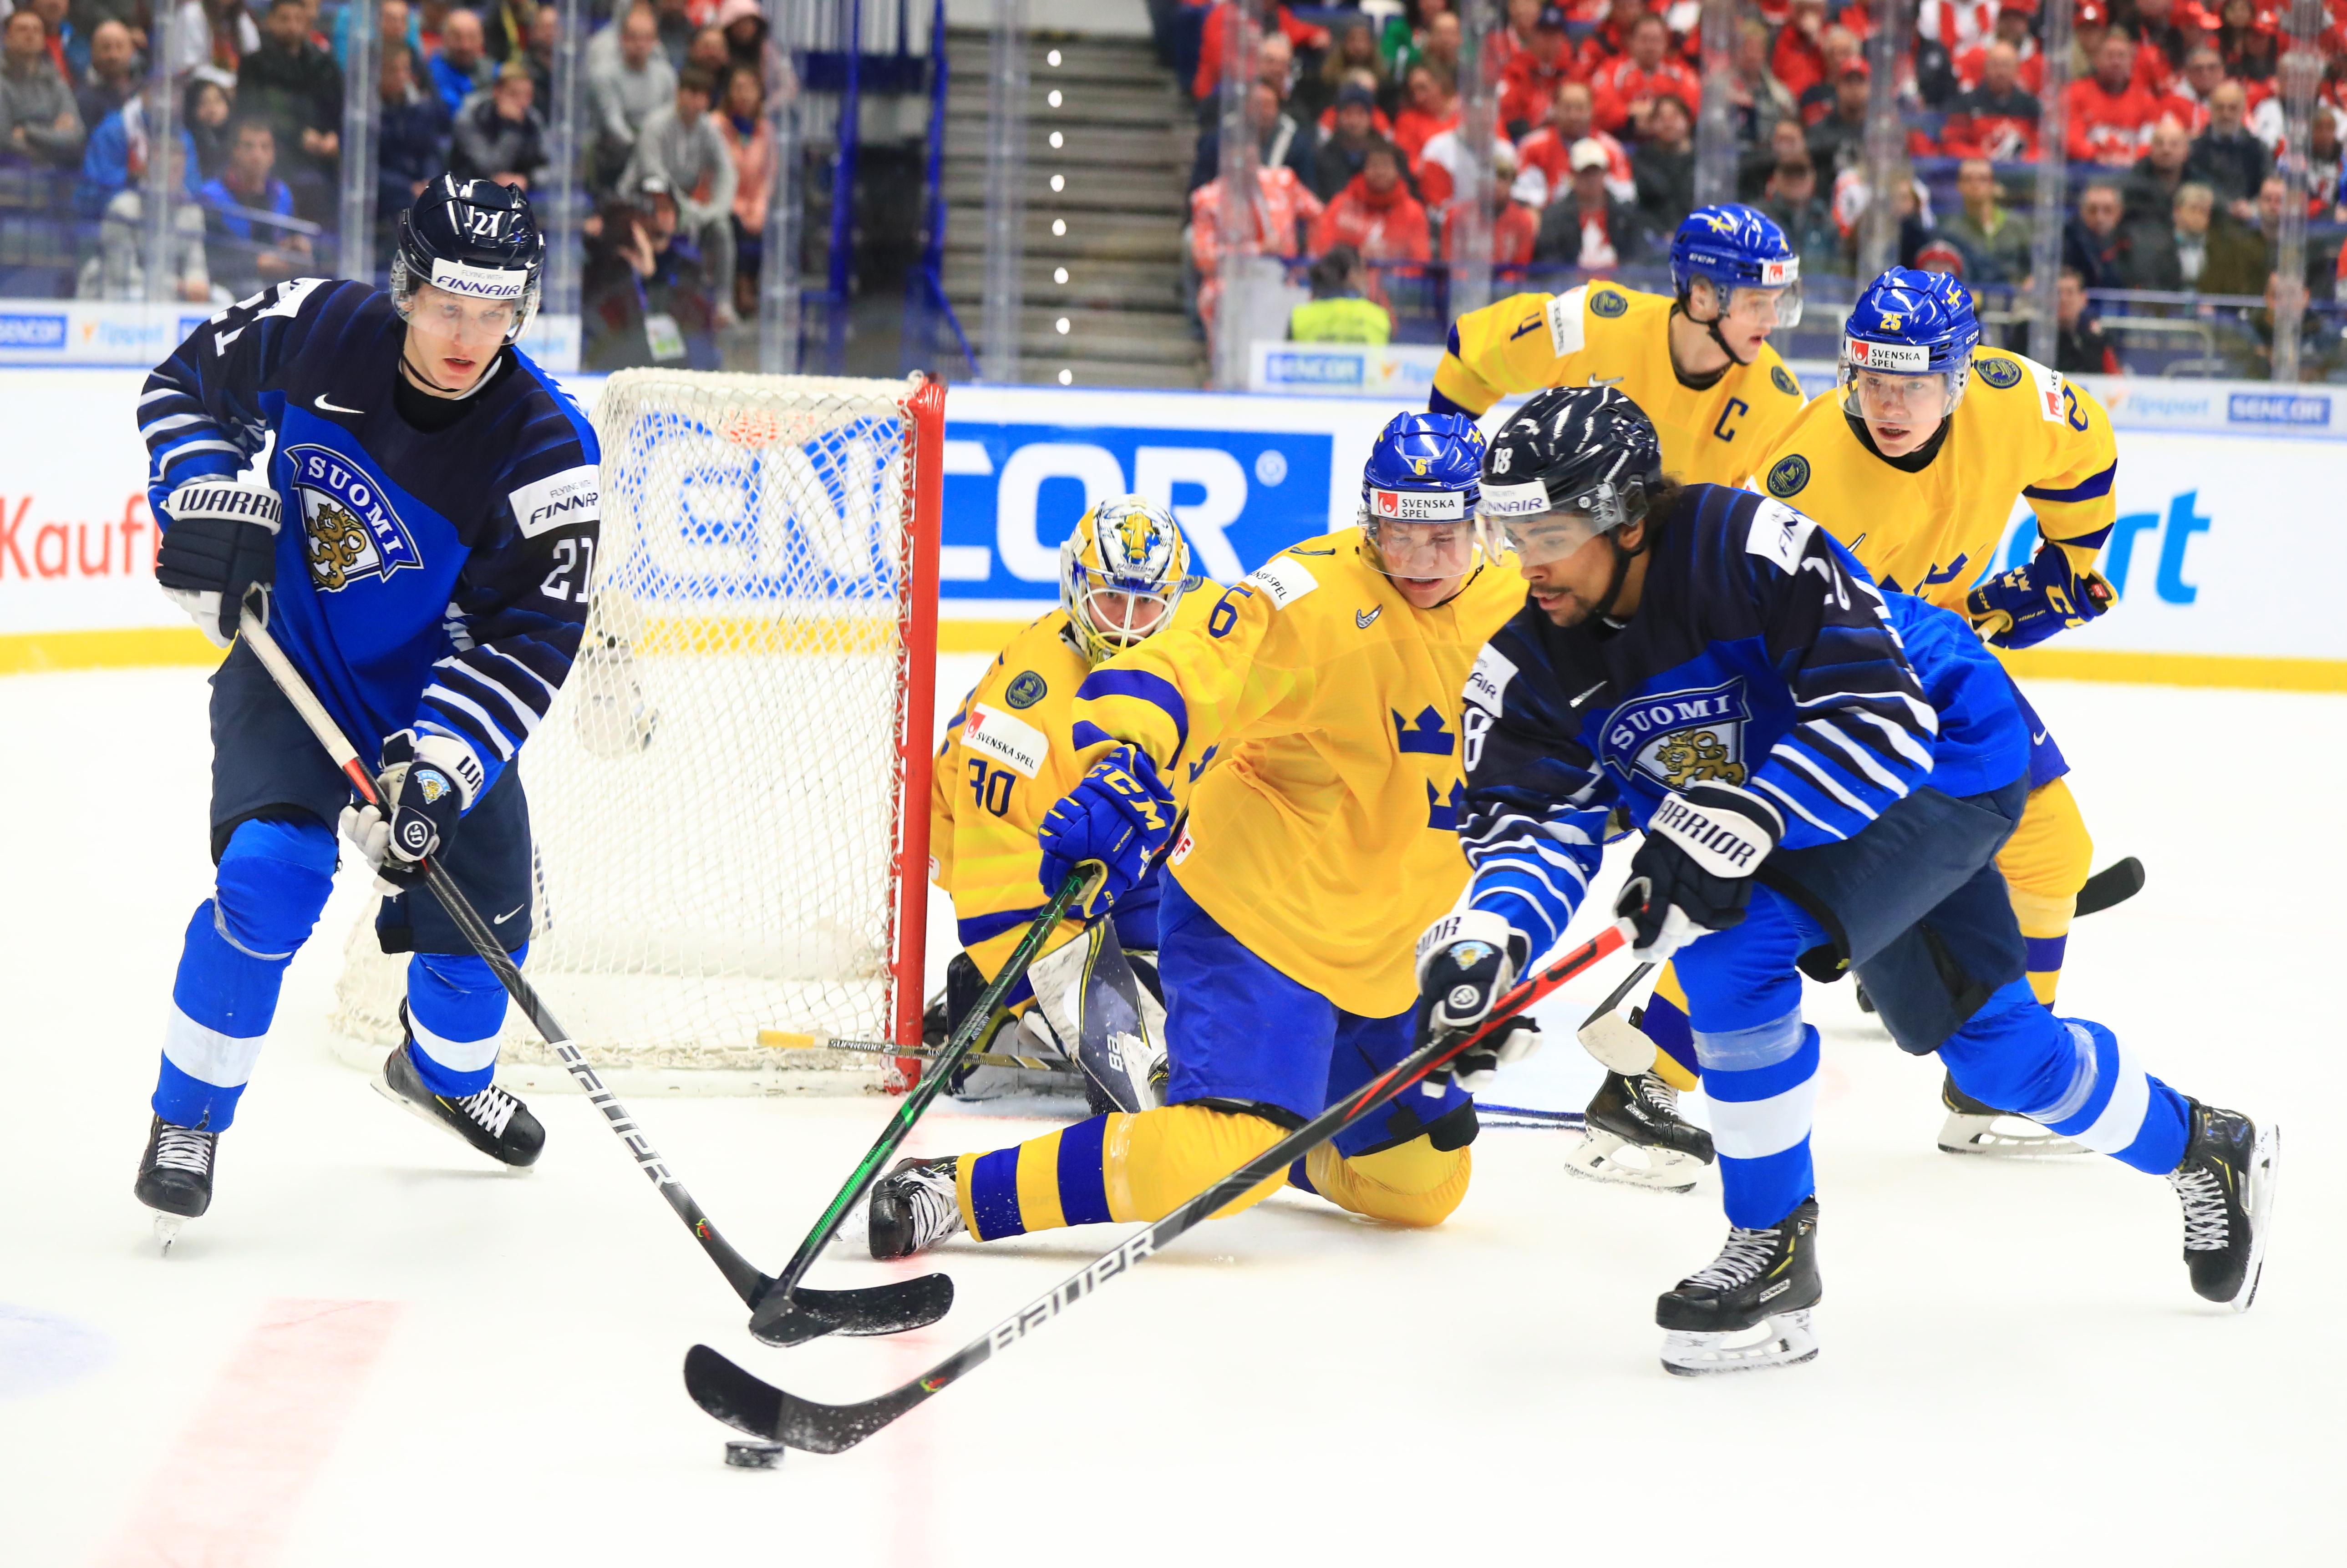 2020 World Junior Ice Hockey Championship, bronze medal match: Sweden vs Finland